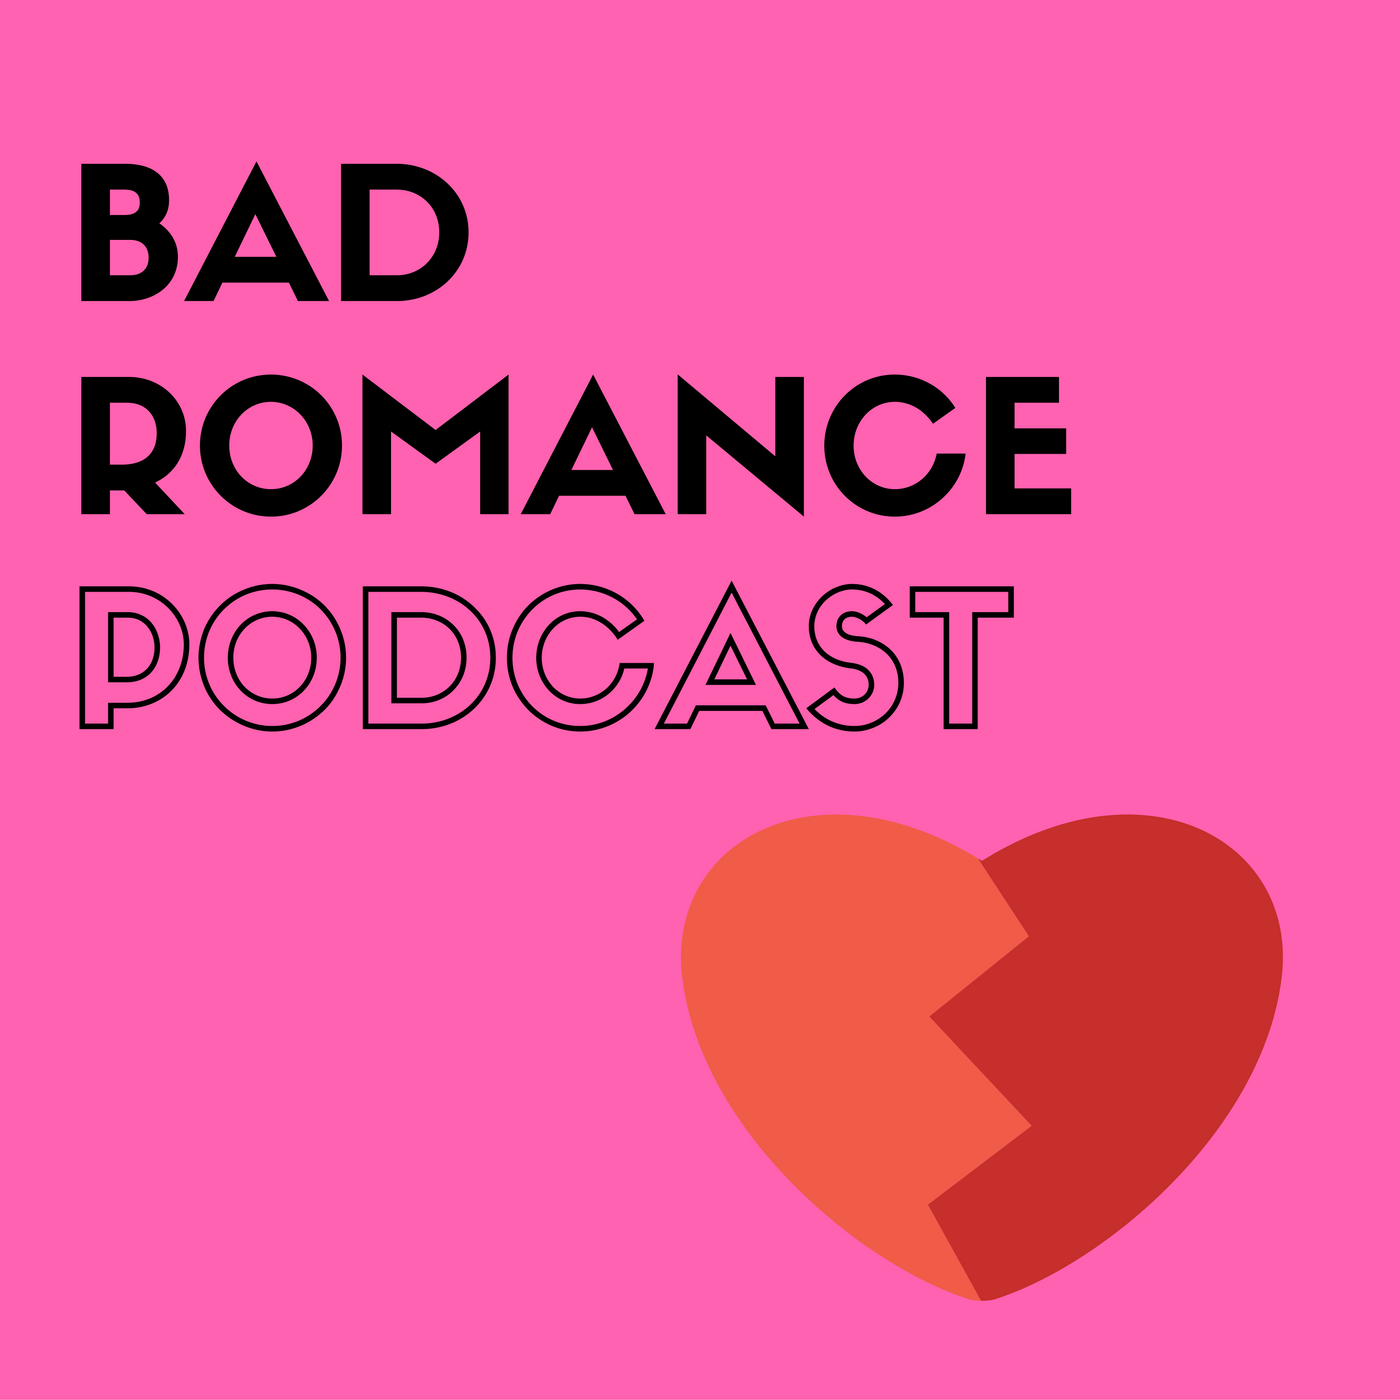 Bad Romance Podcast show art